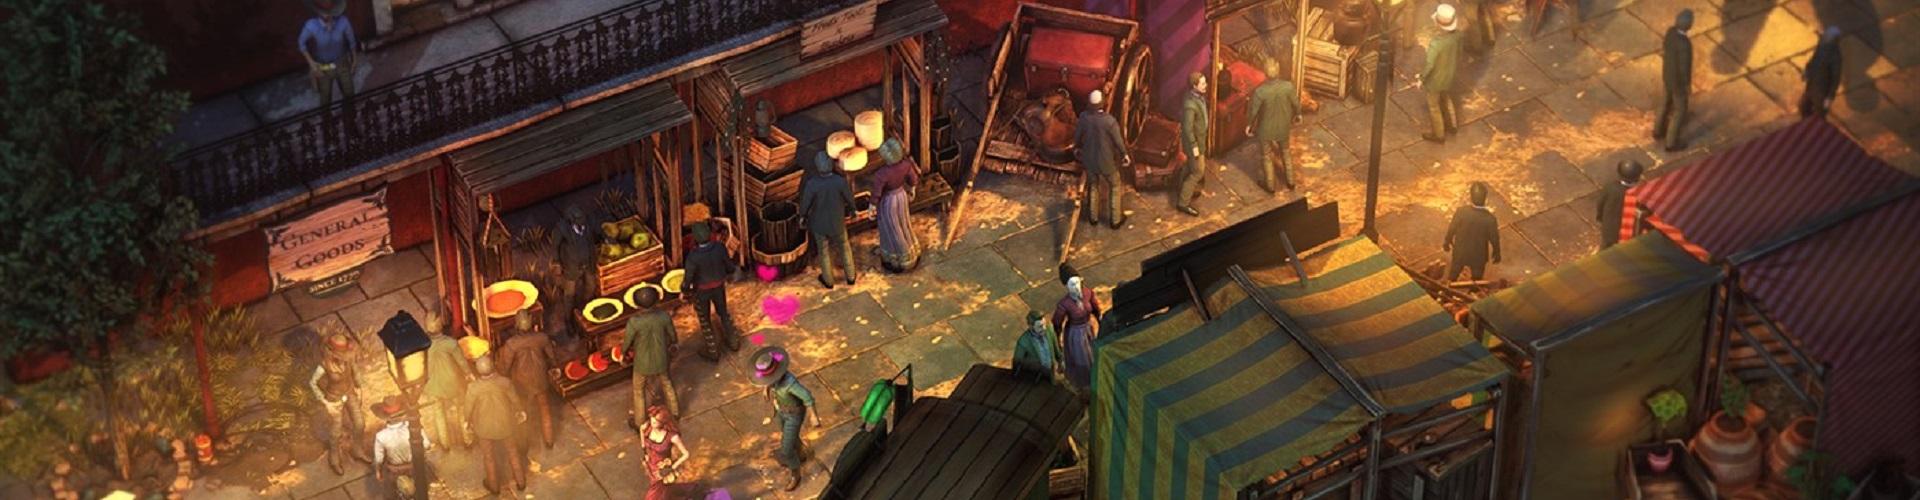 Desperados Iii Review Xbox Tavern